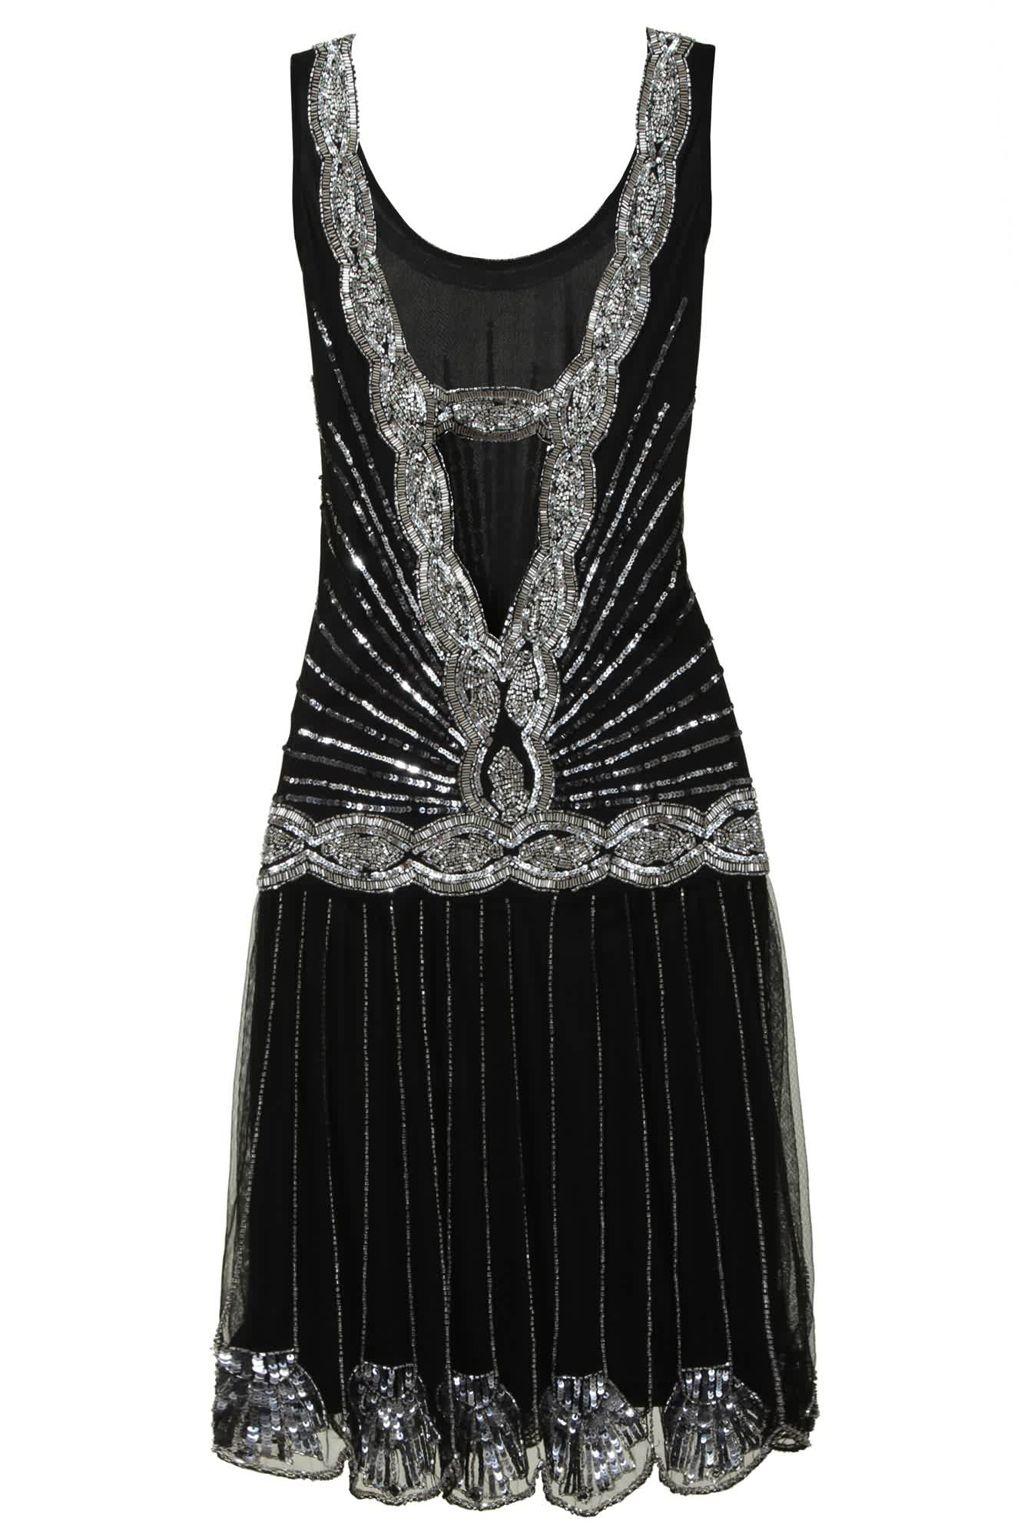 Картинки по запросу flapper dress | Zyla playful winter | Pinterest ...